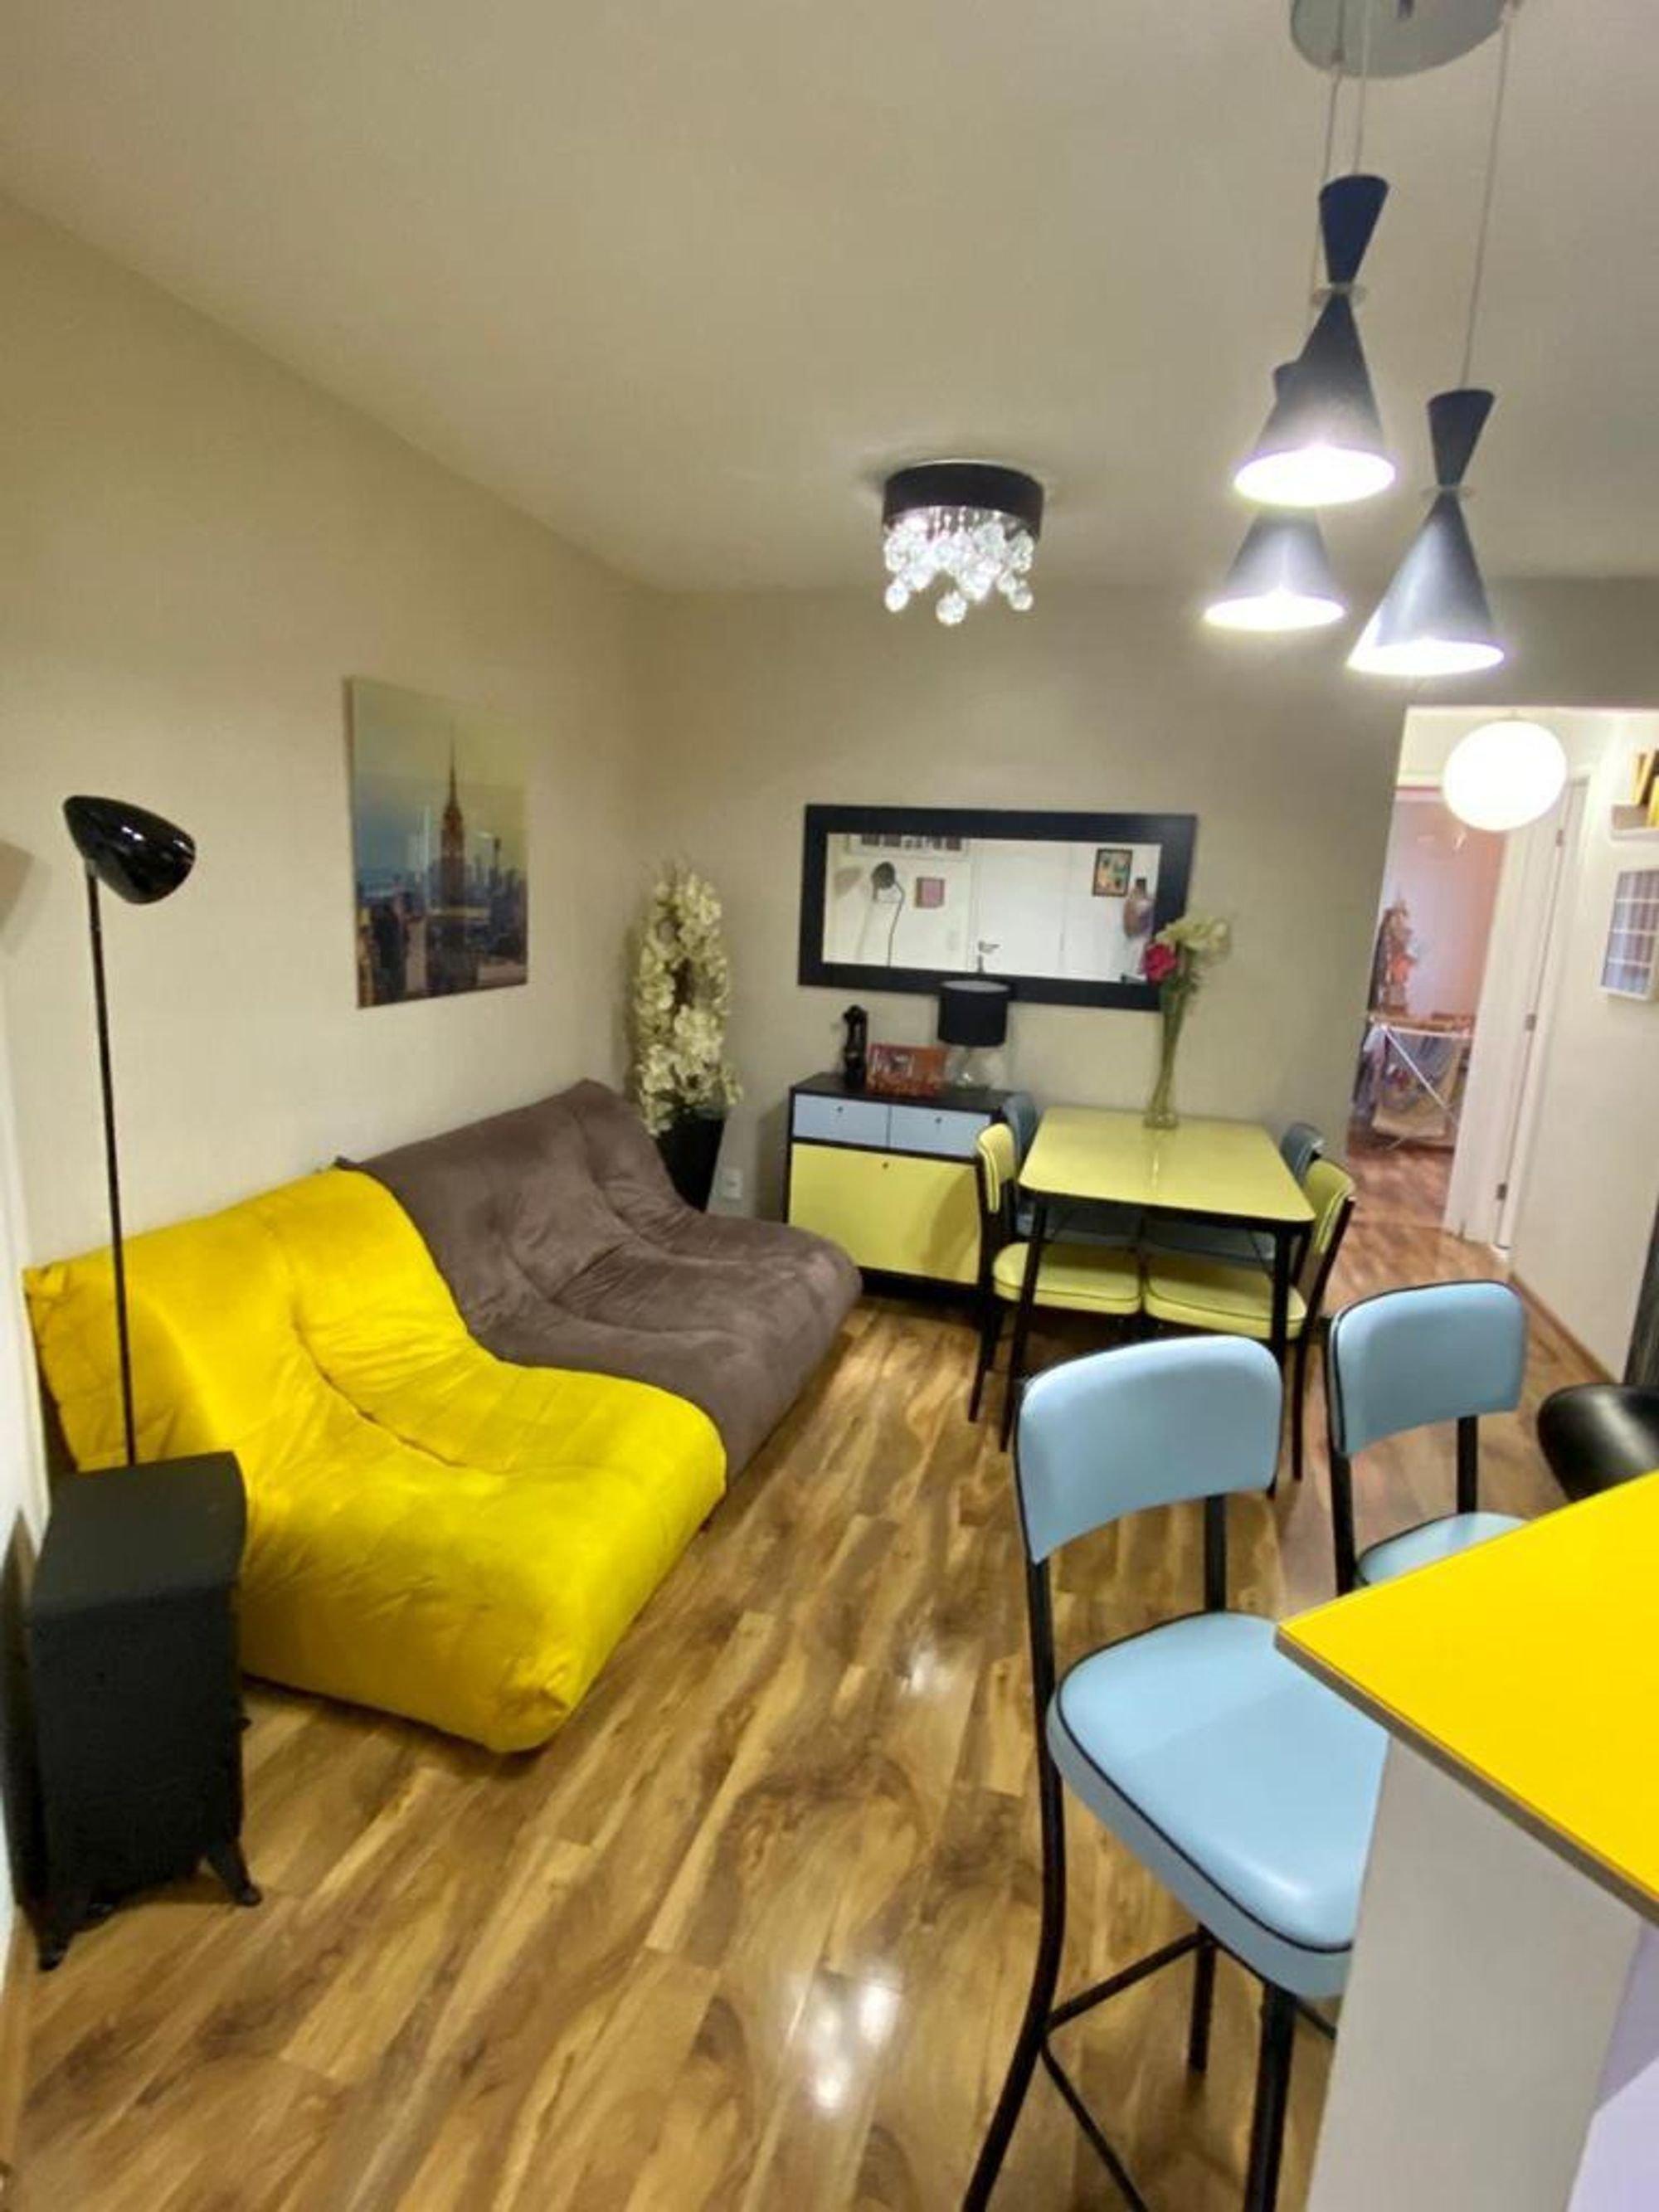 Foto de Sala com cama, vaso, cadeira, mesa de jantar